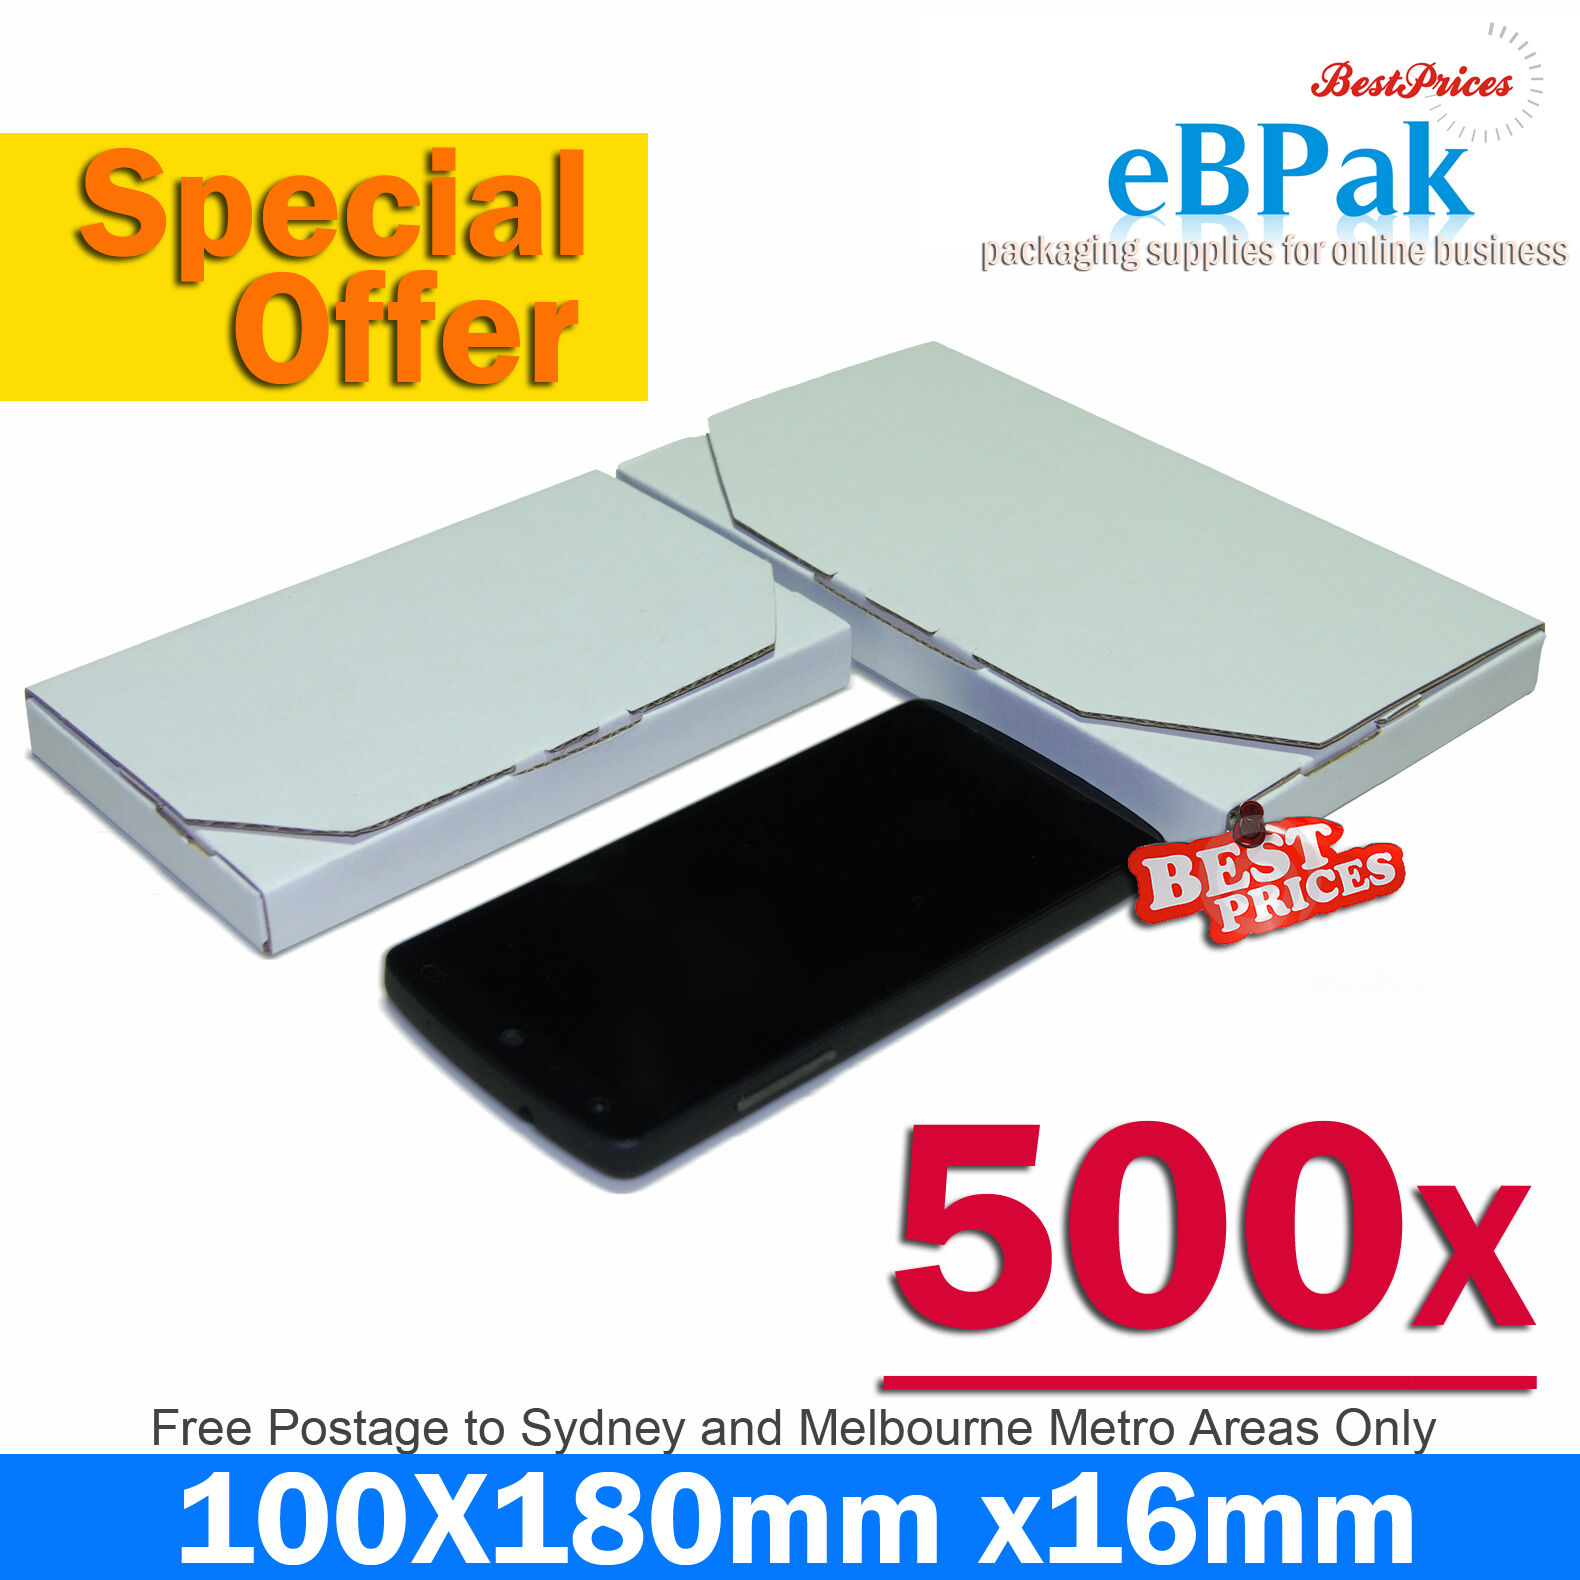 1200 X CARDBOARD BOXES 200 x 150 x 100 MM-Very Sturdy Cardboard